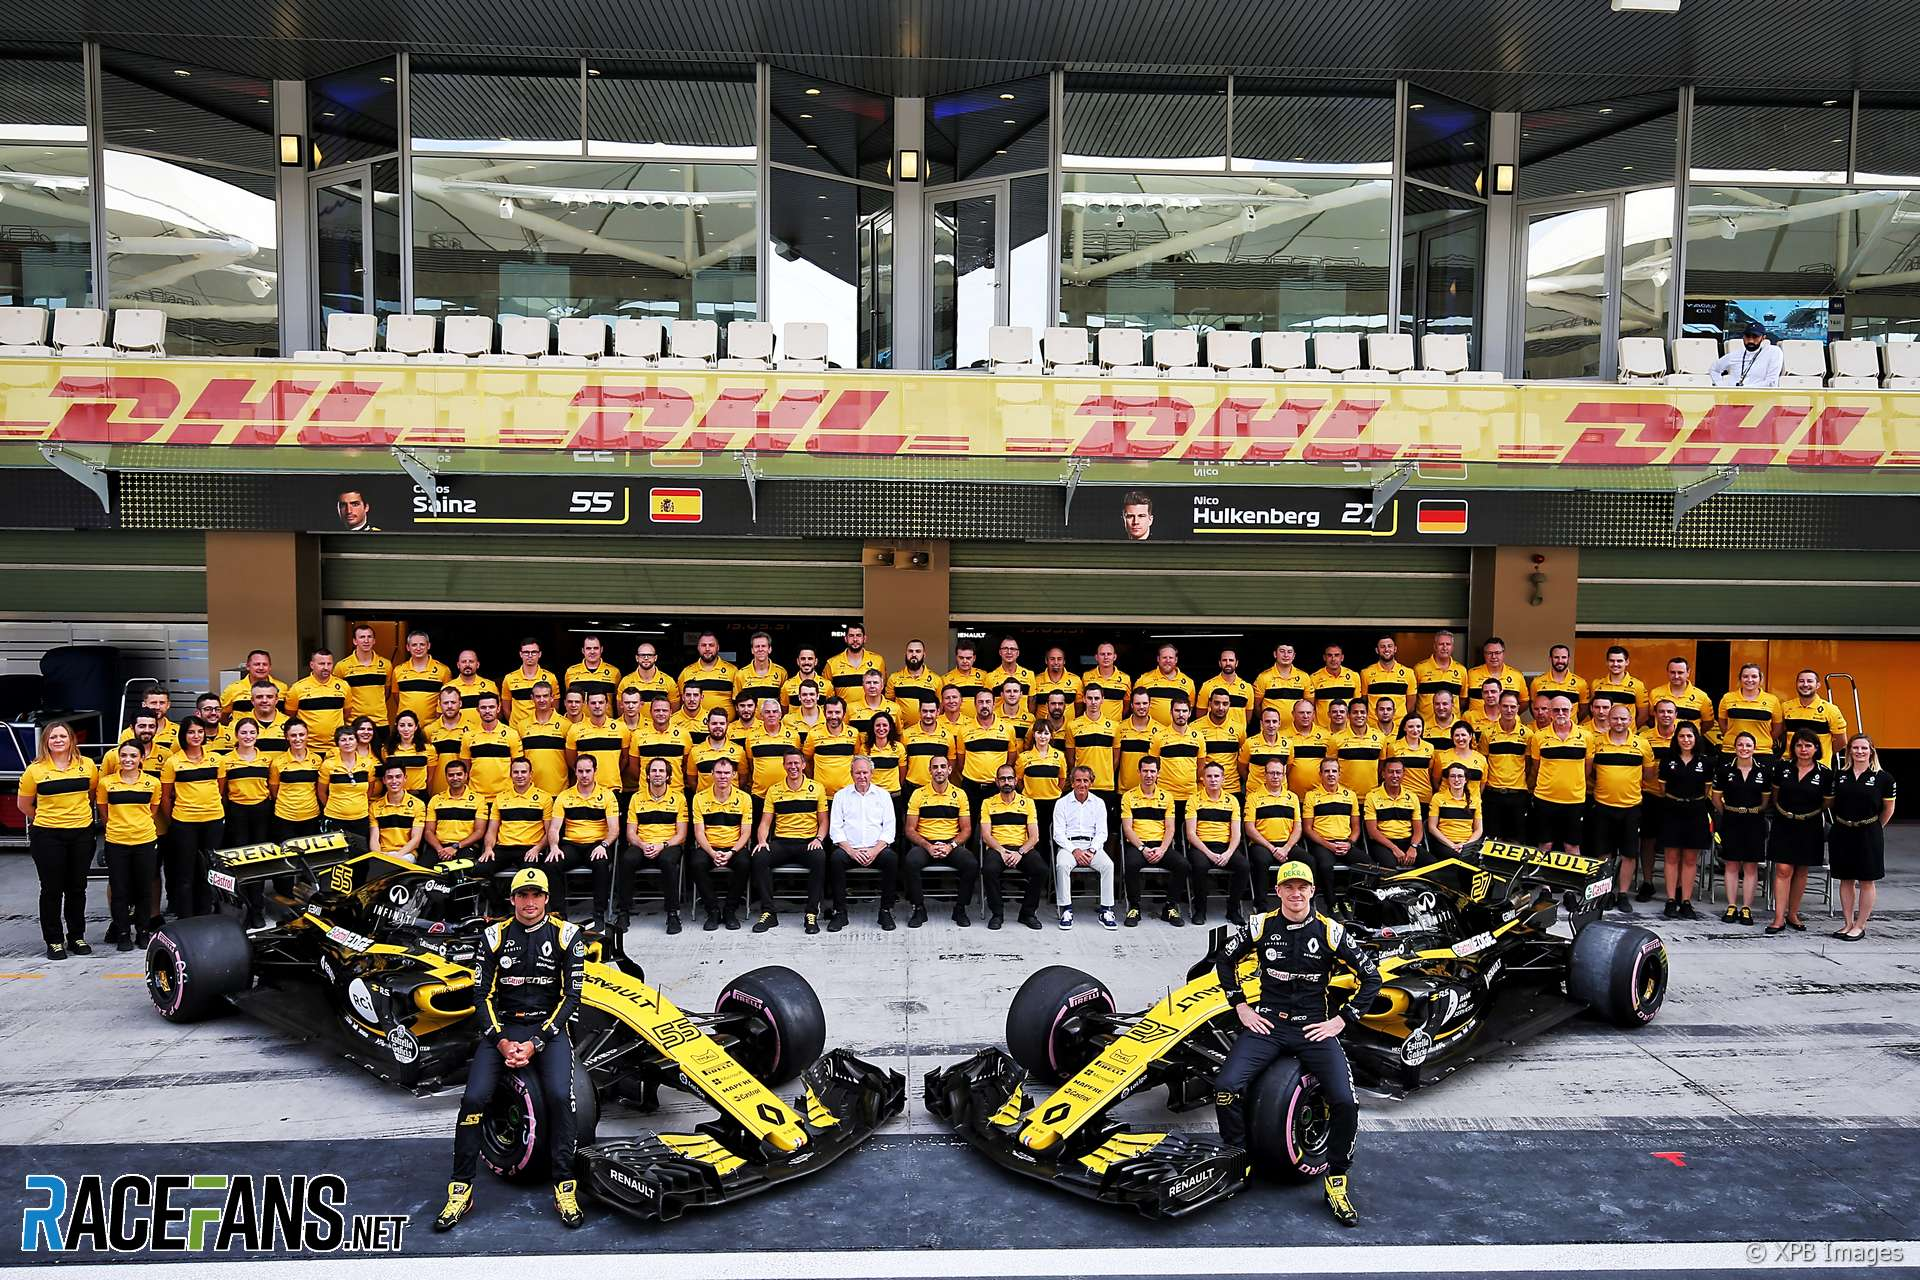 menos Nuez Fe ciega  Renault F1 team - history, information and links